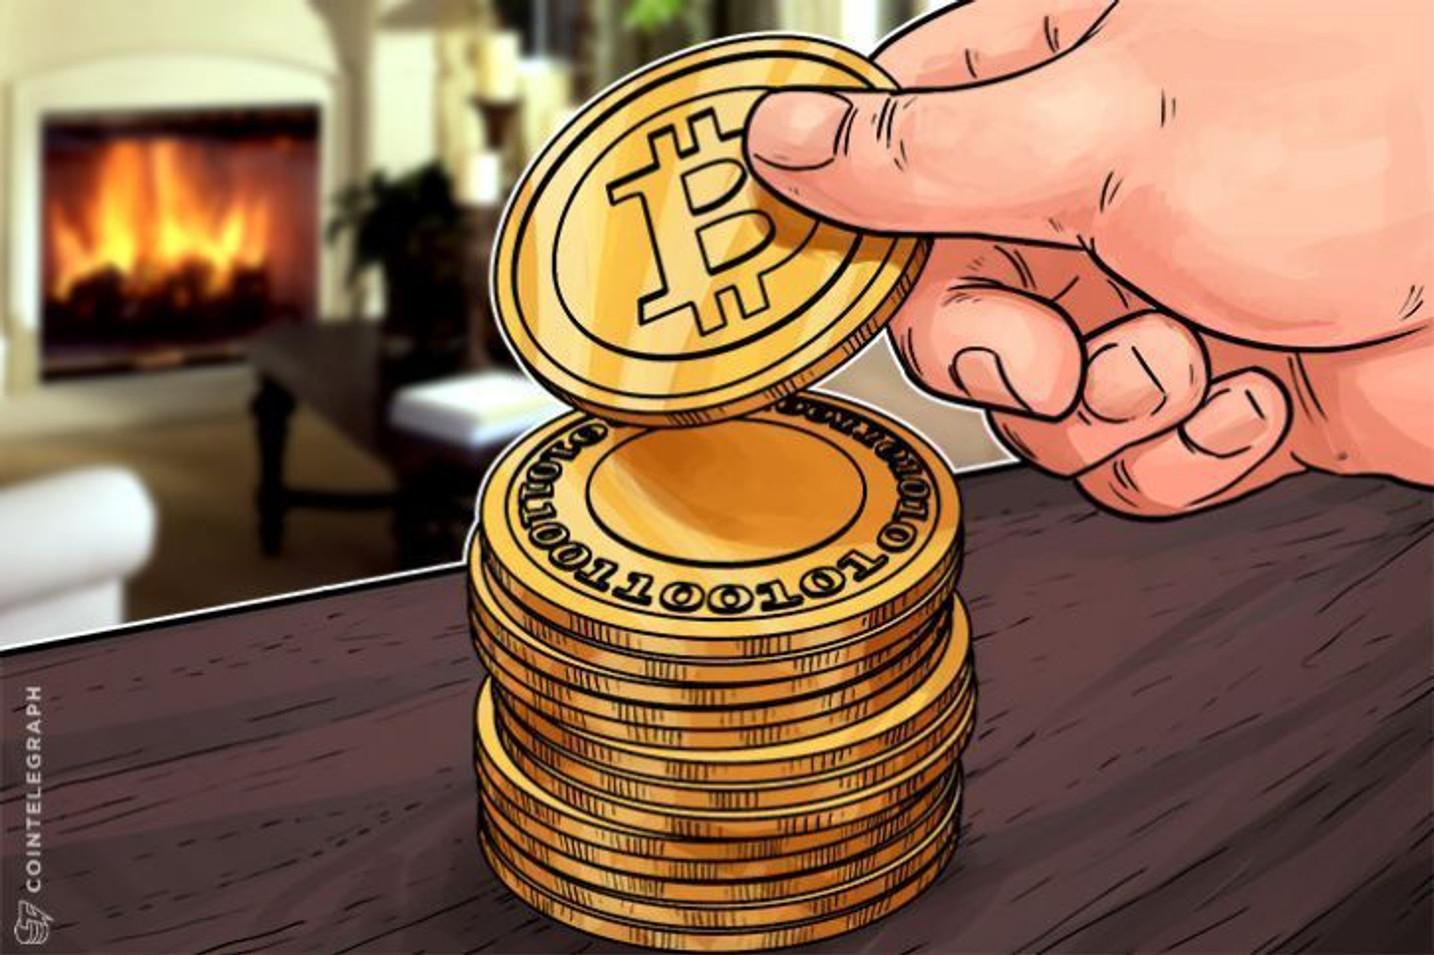 You Can Buy Vanuatu Citizenship With Bitcoin, 43 BTC Worth Today